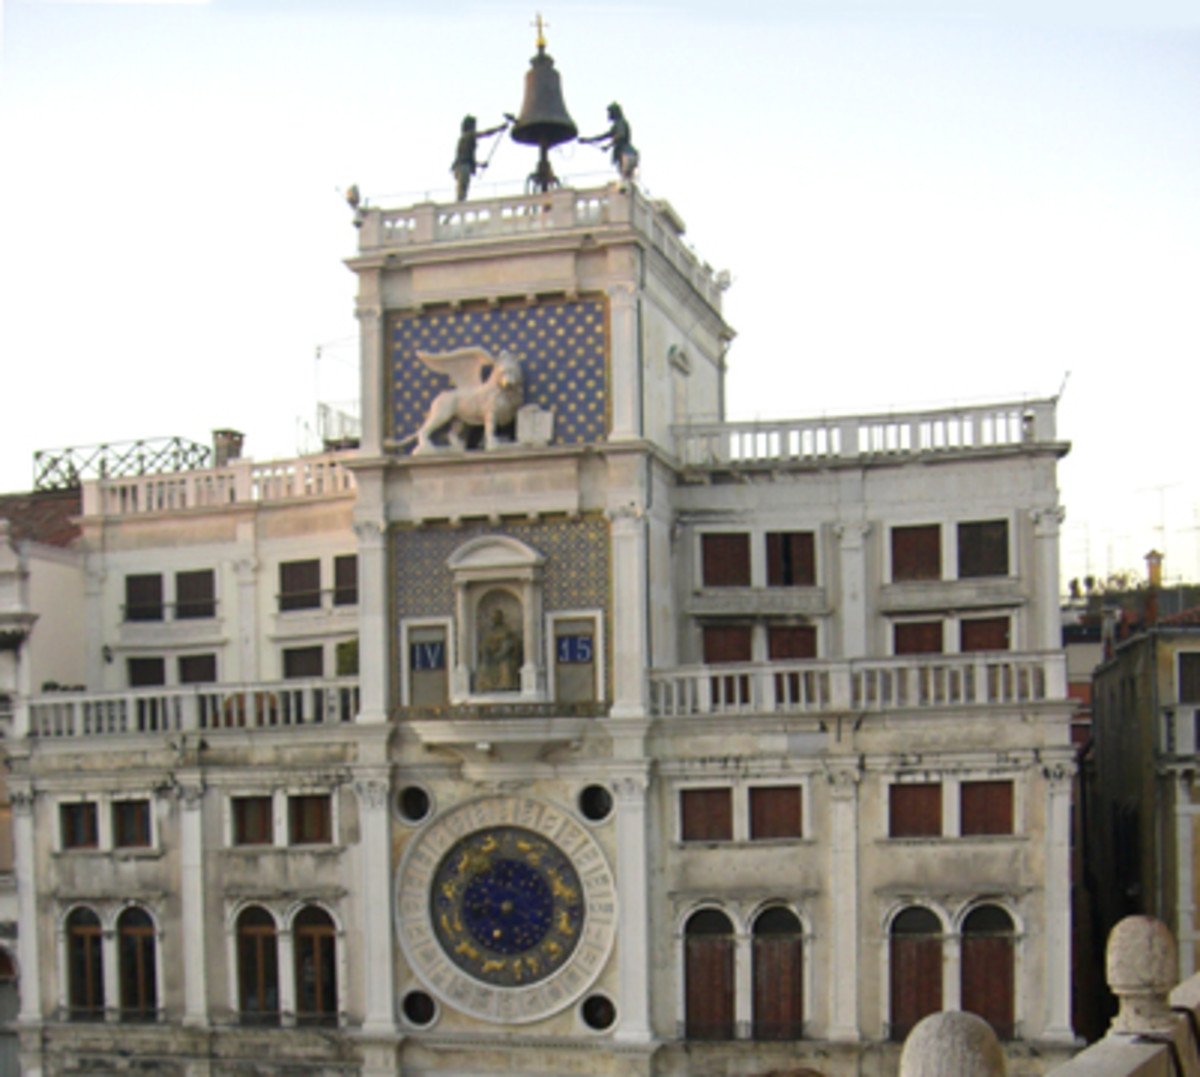 Saint Mark's Square Clocktower